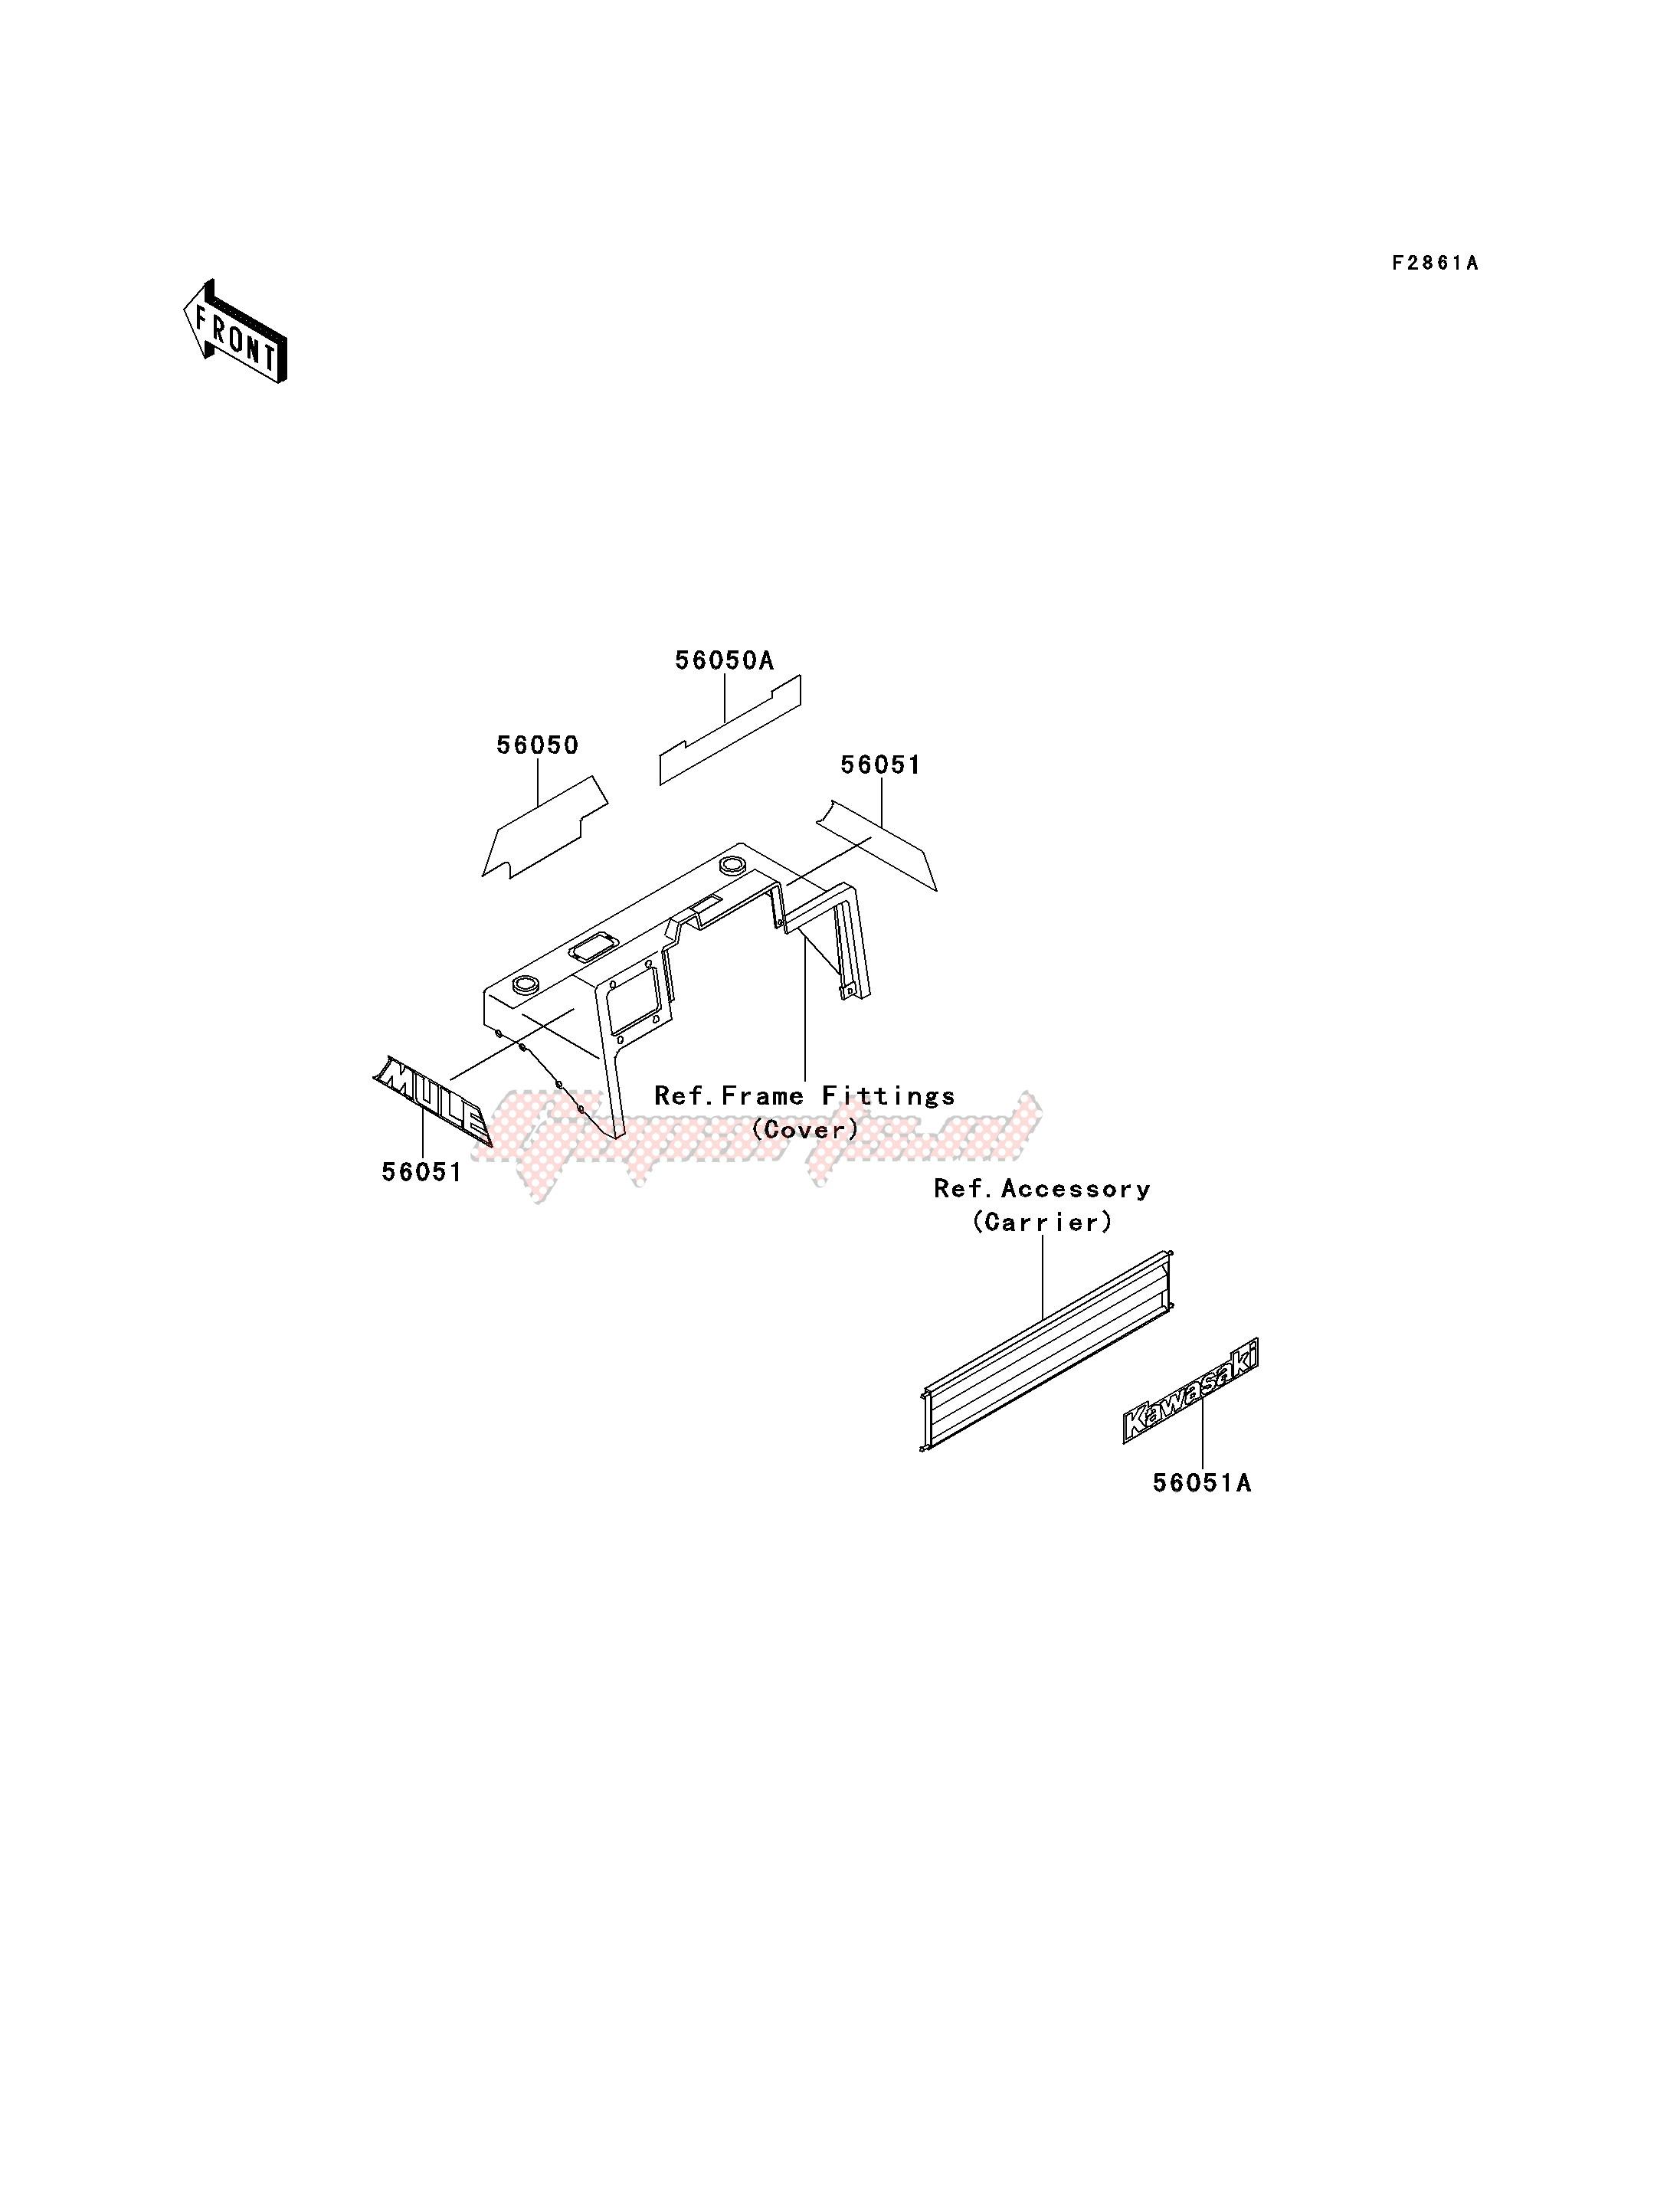 DECALS-- KAF620-B3_B4- - image